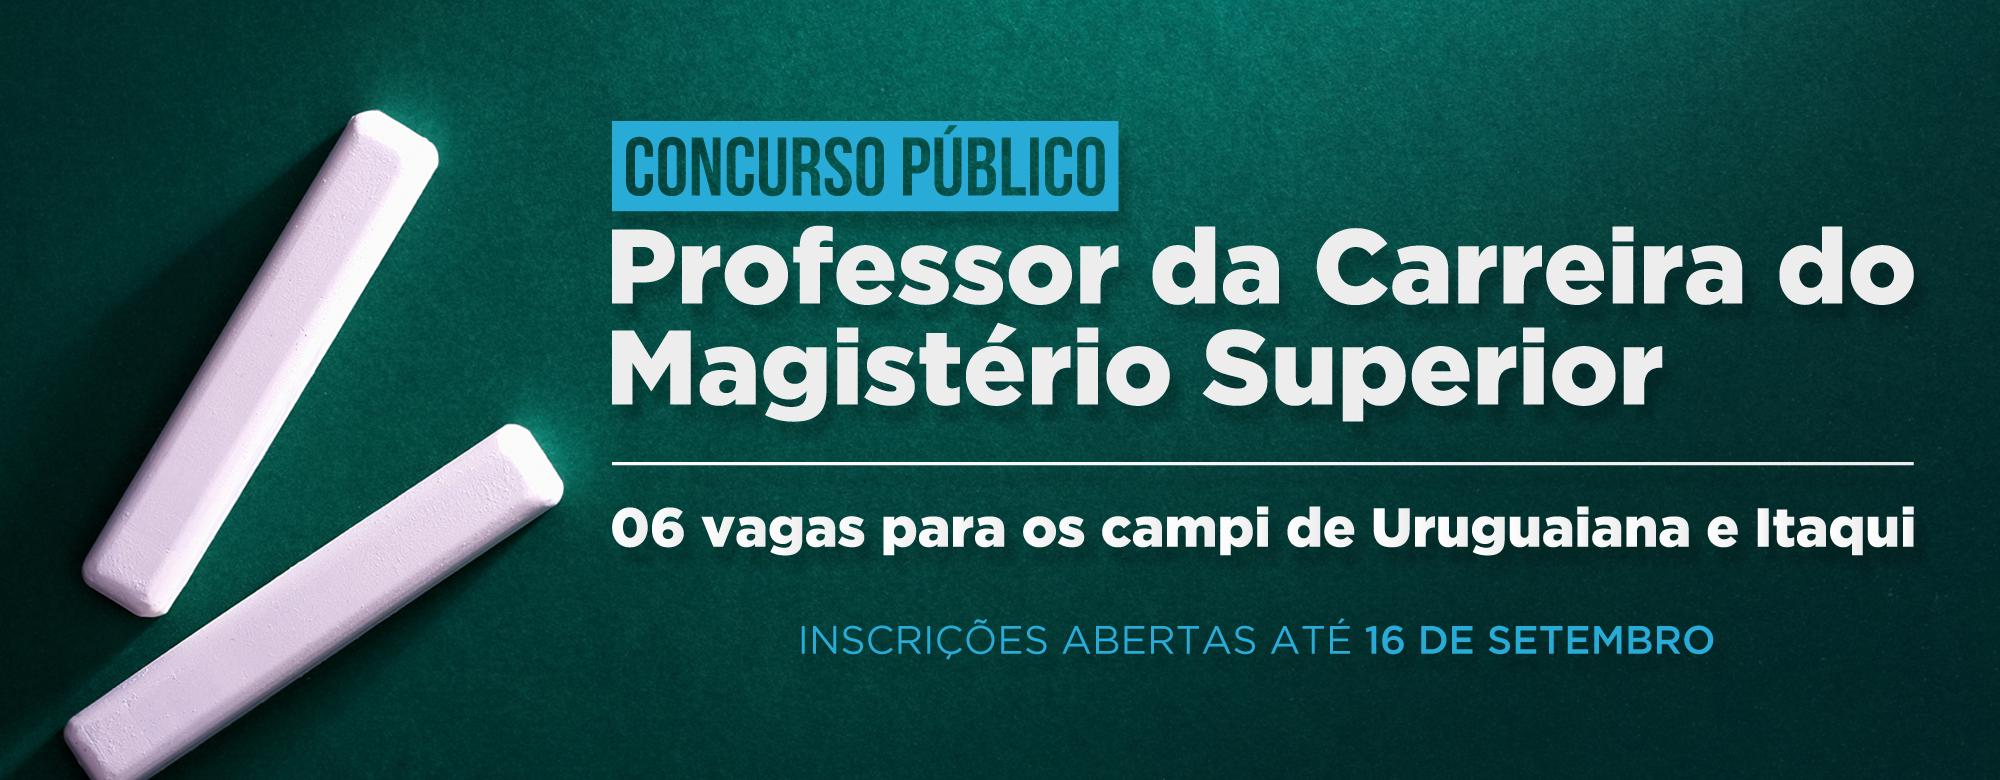 Unipampa abre novo concurso público para professor